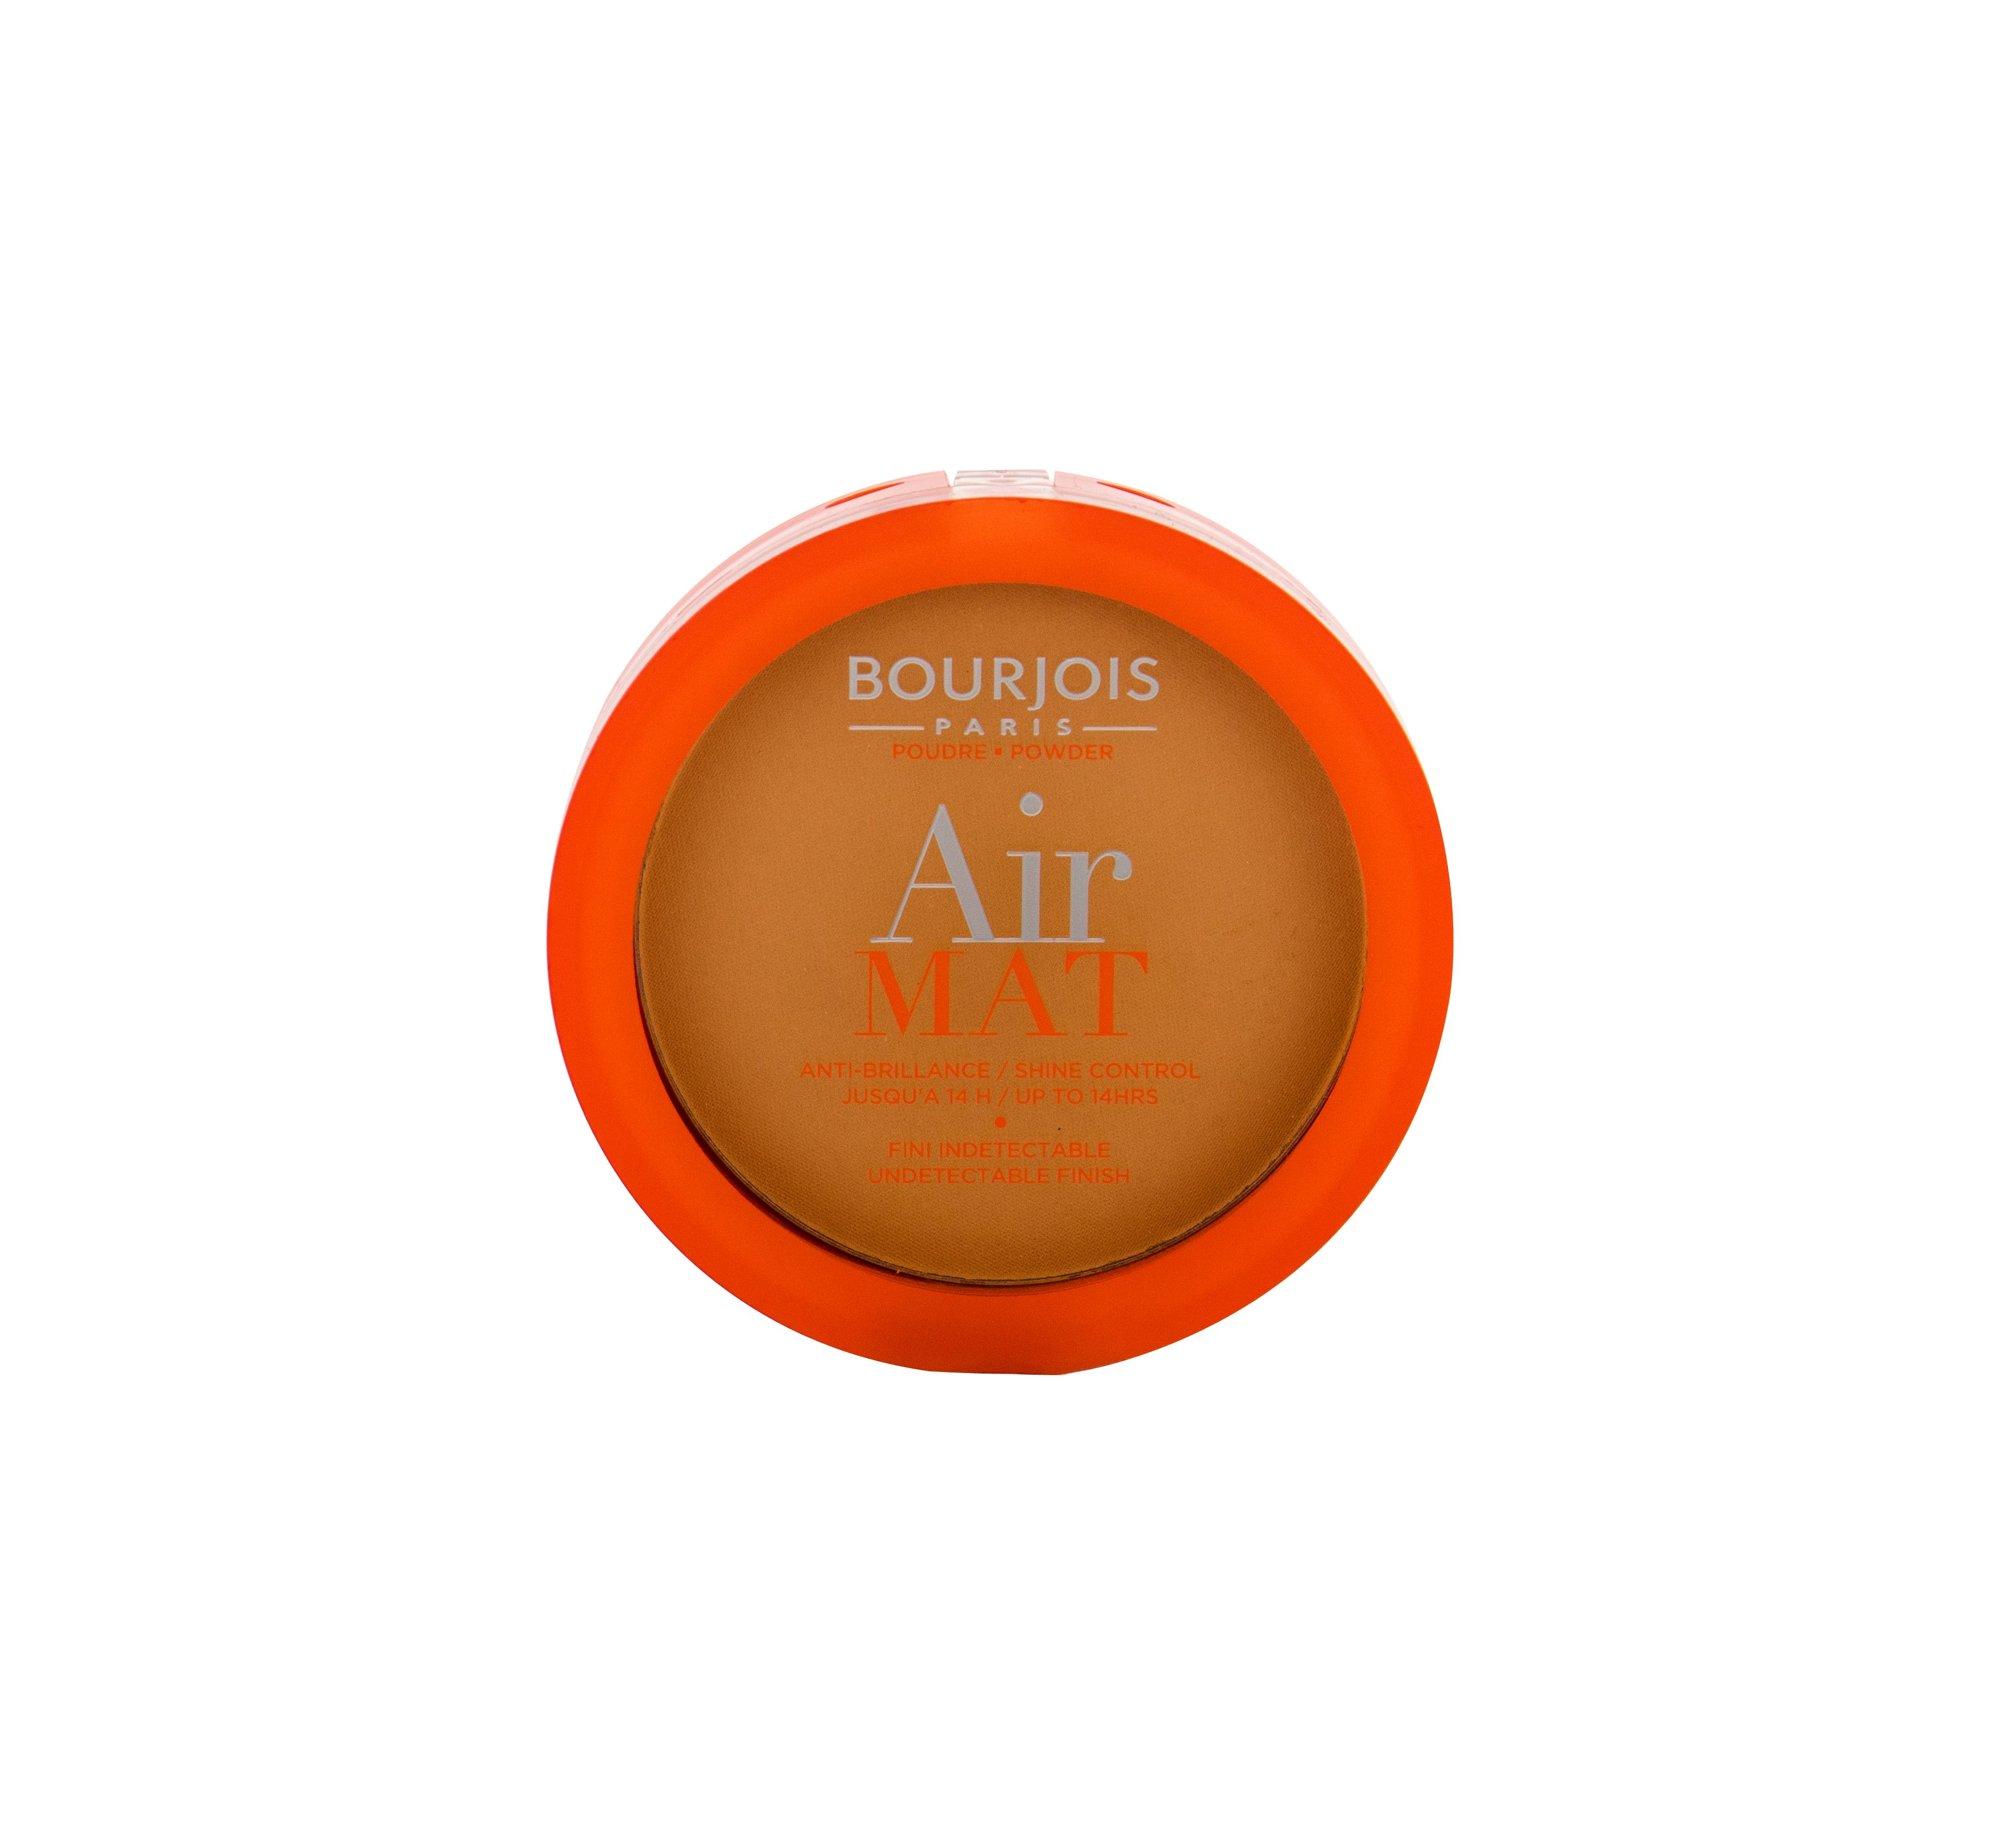 BOURJOIS Paris Air Mat Powder 10ml 05 Caramel